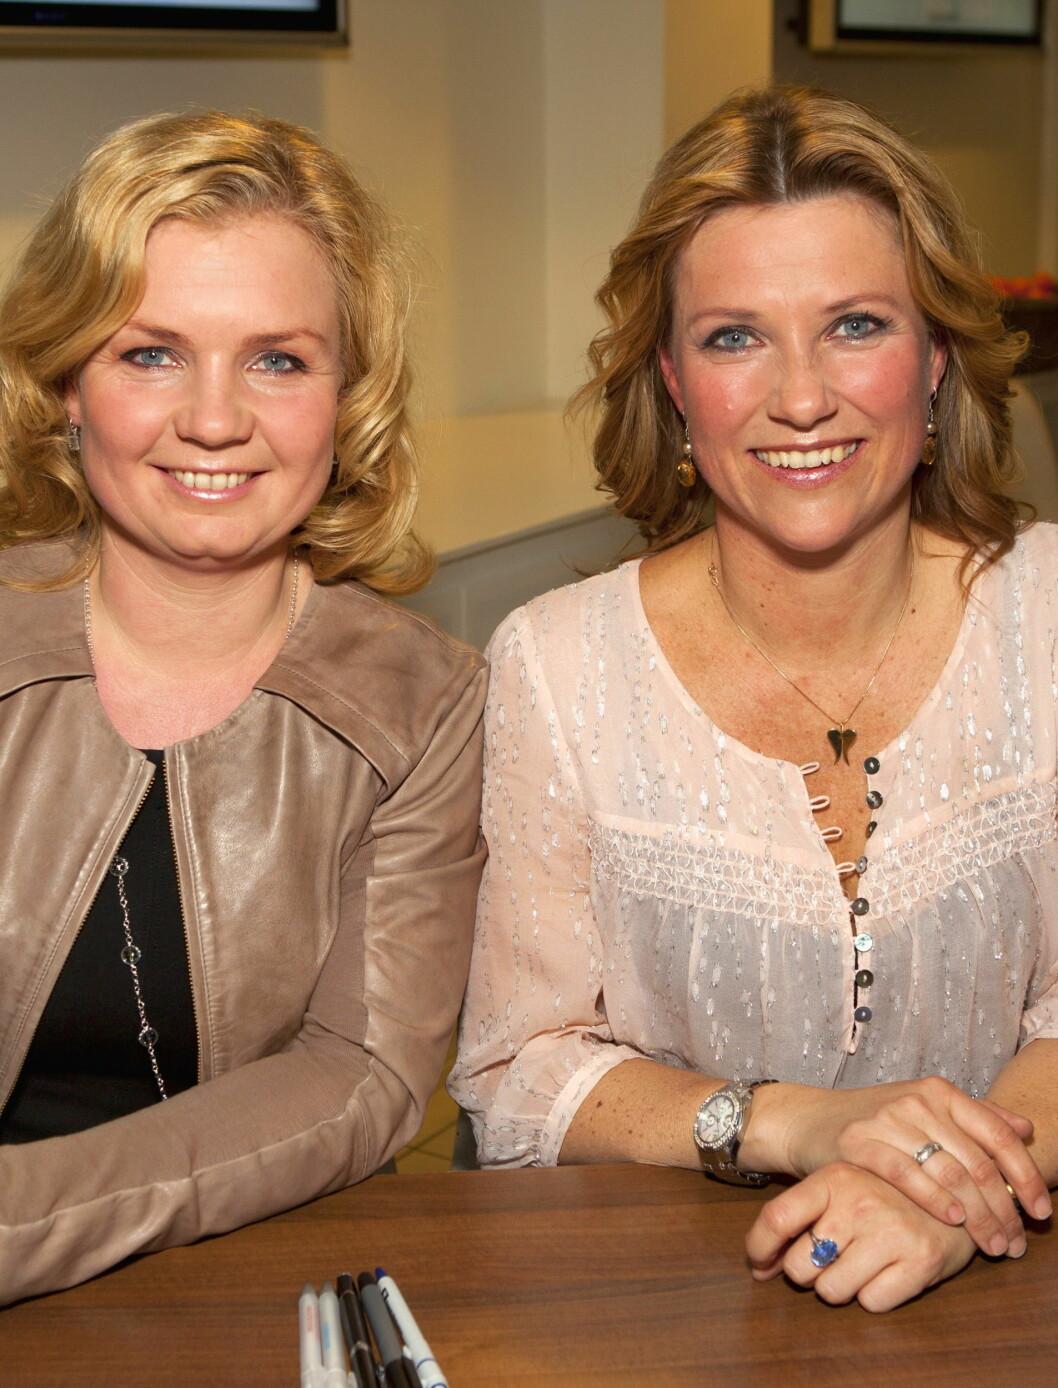 ENGLEVENNER: Prinsesse Märtha driver Engleskolen med sin gode venn Elisabeth Nordeng.